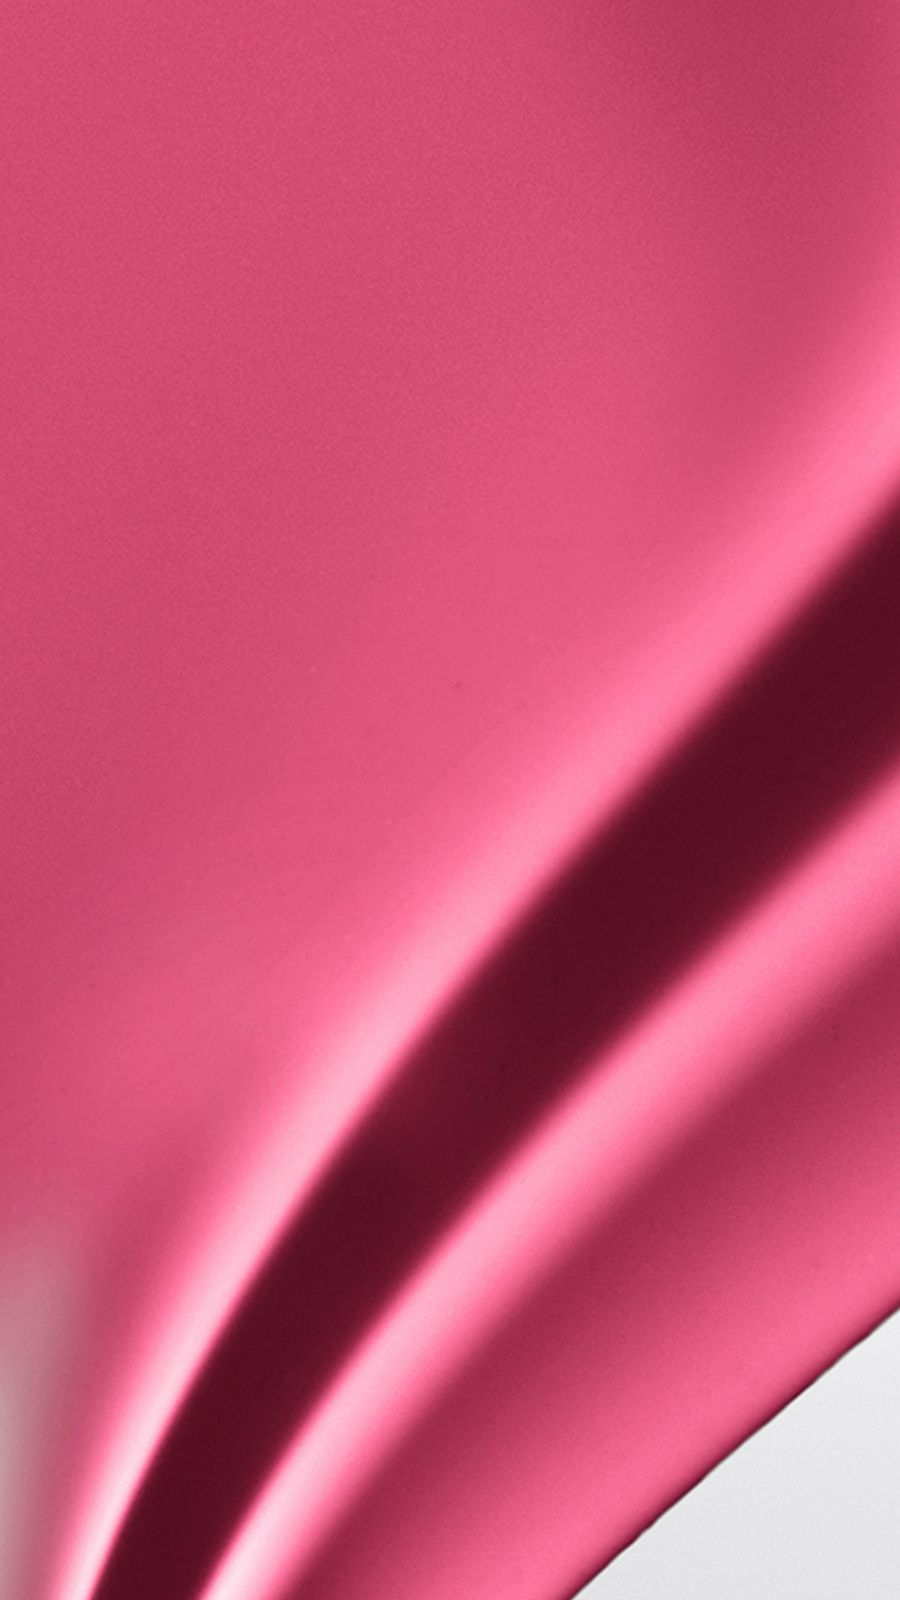 Hibiscus 13 Lip Glow - Hibiscus No.13 - Image 2